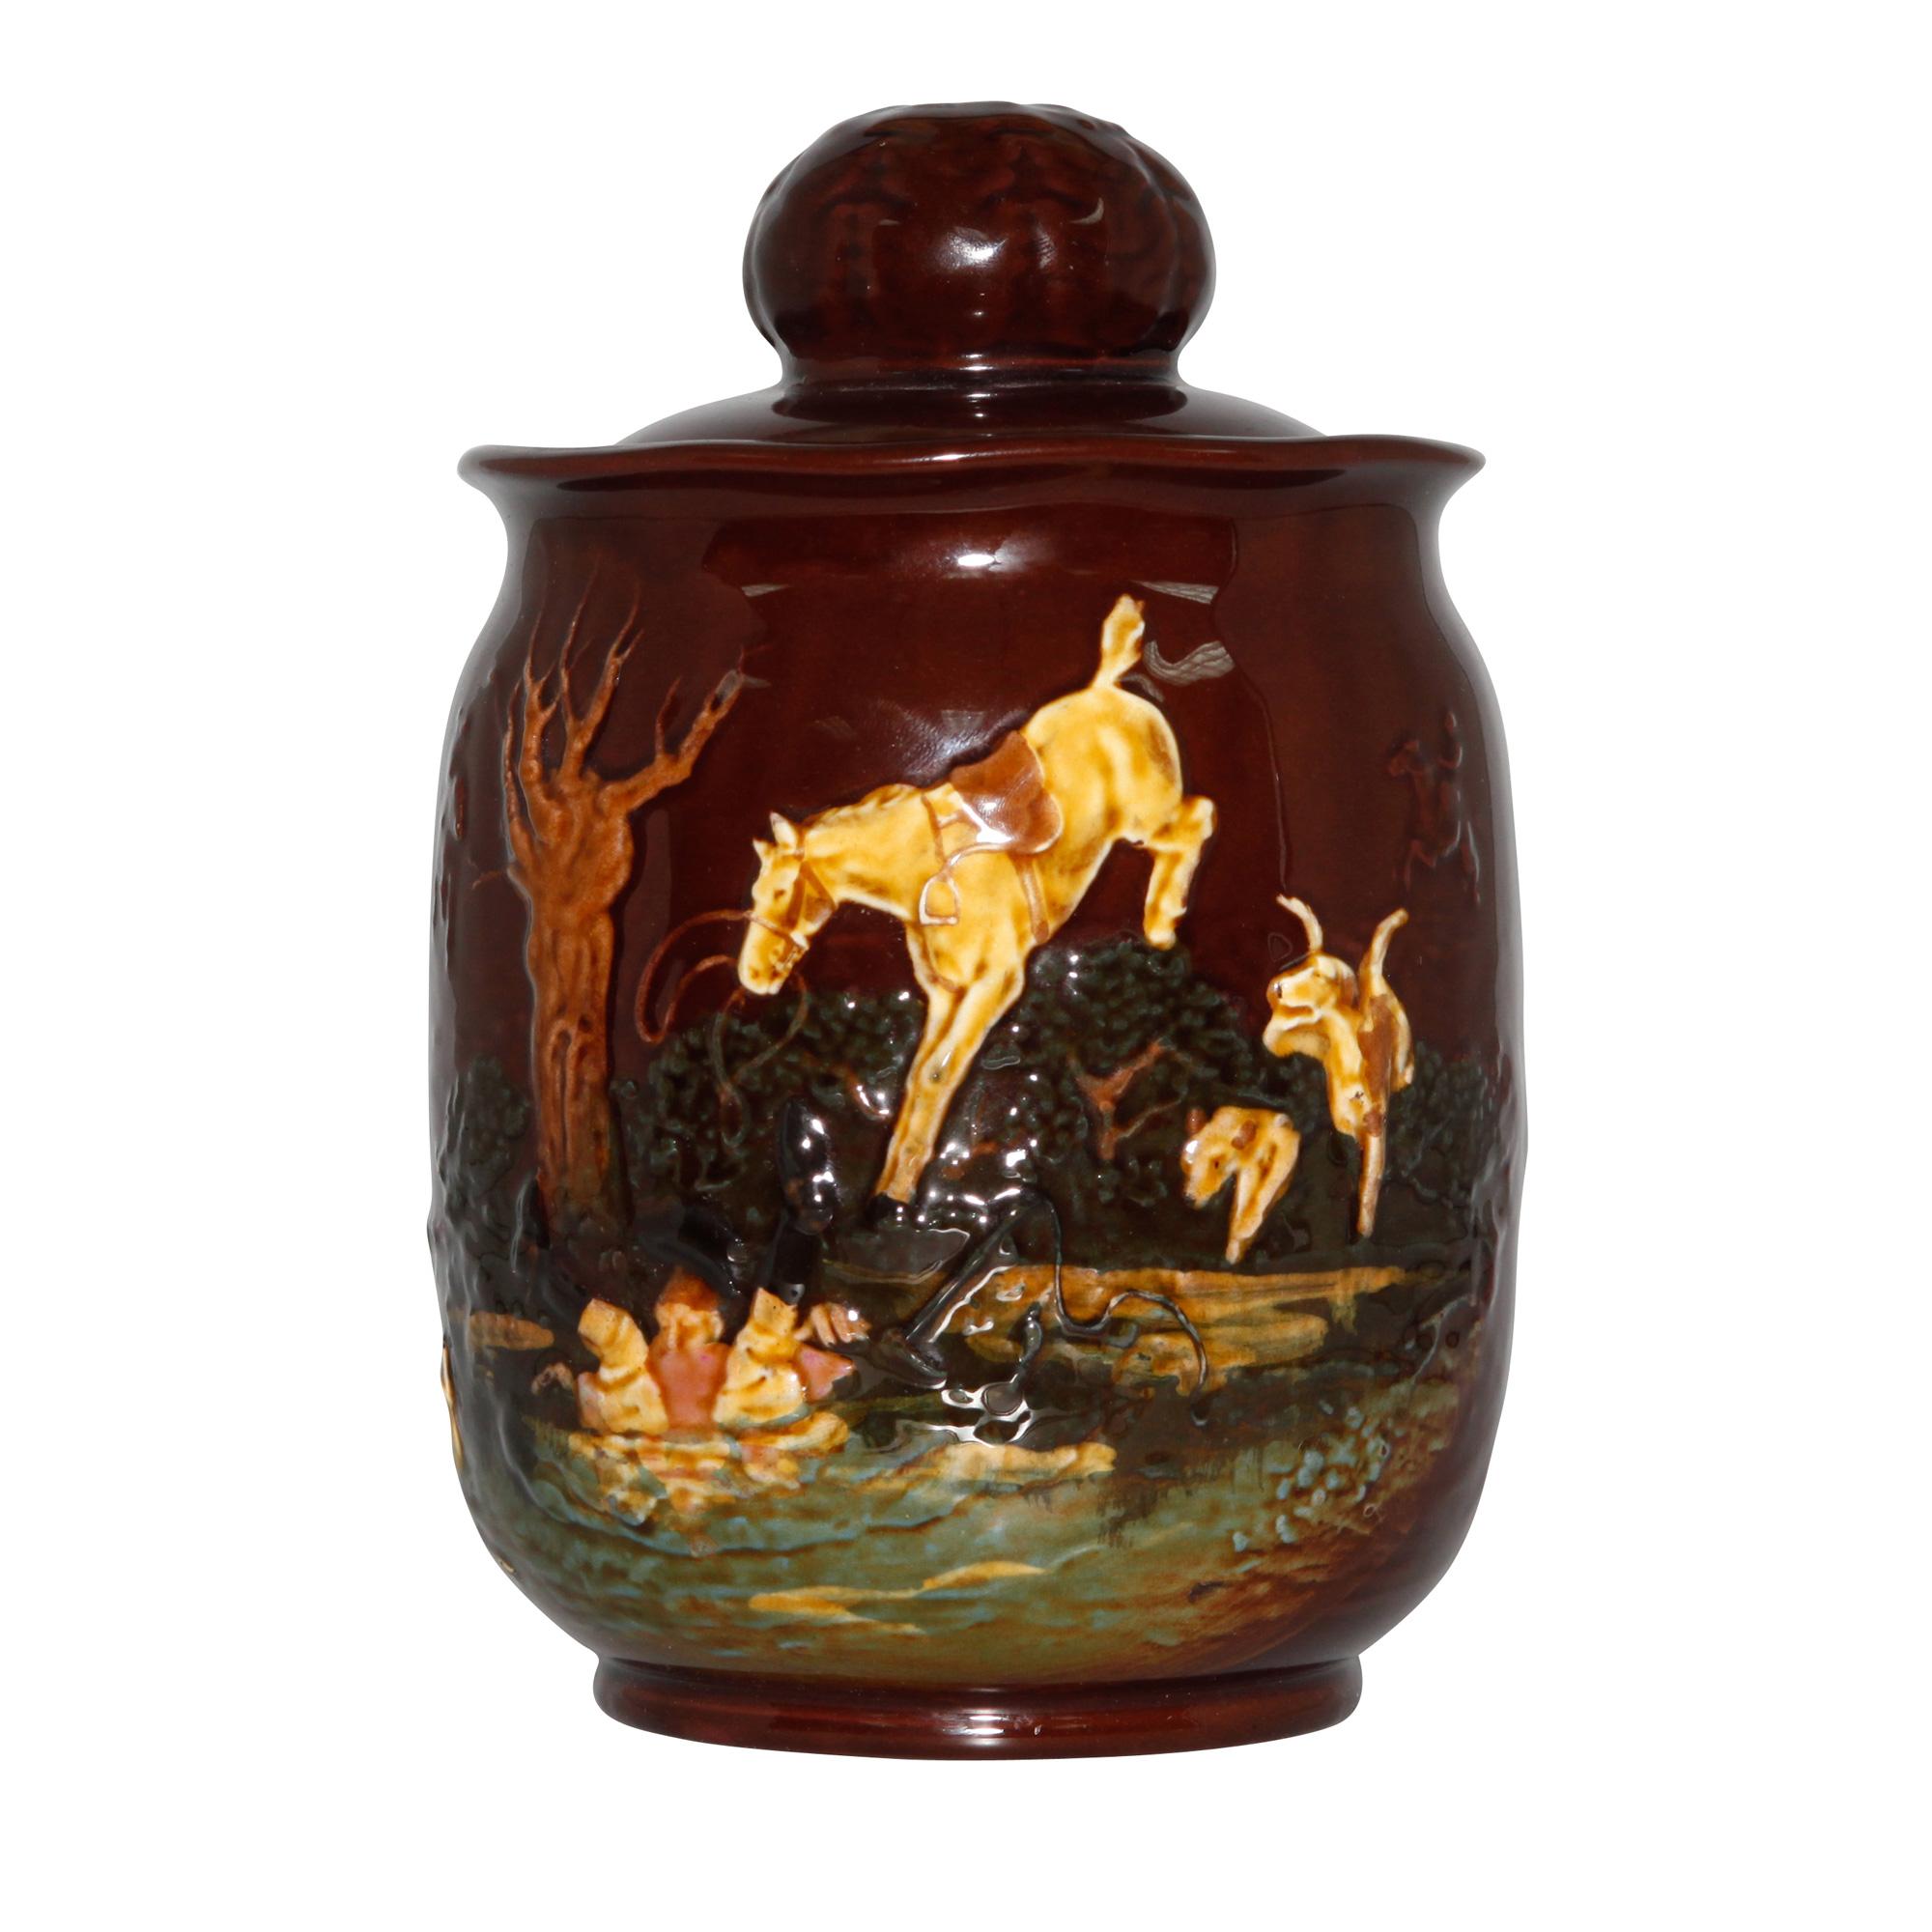 Kingsware Hunting Tobacco Jar